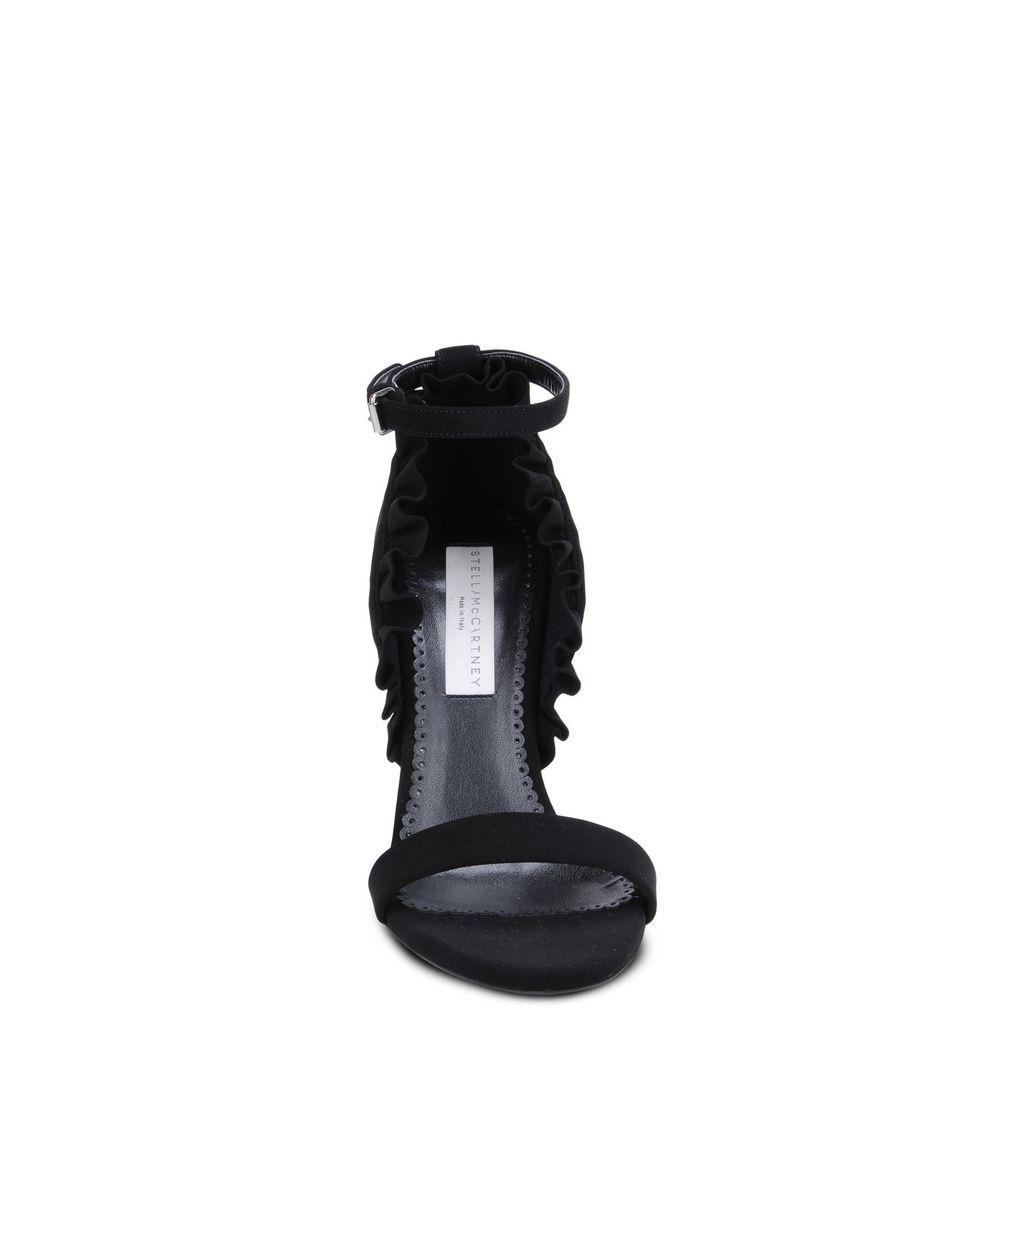 Black ruffle sandals - STELLA MCCARTNEY